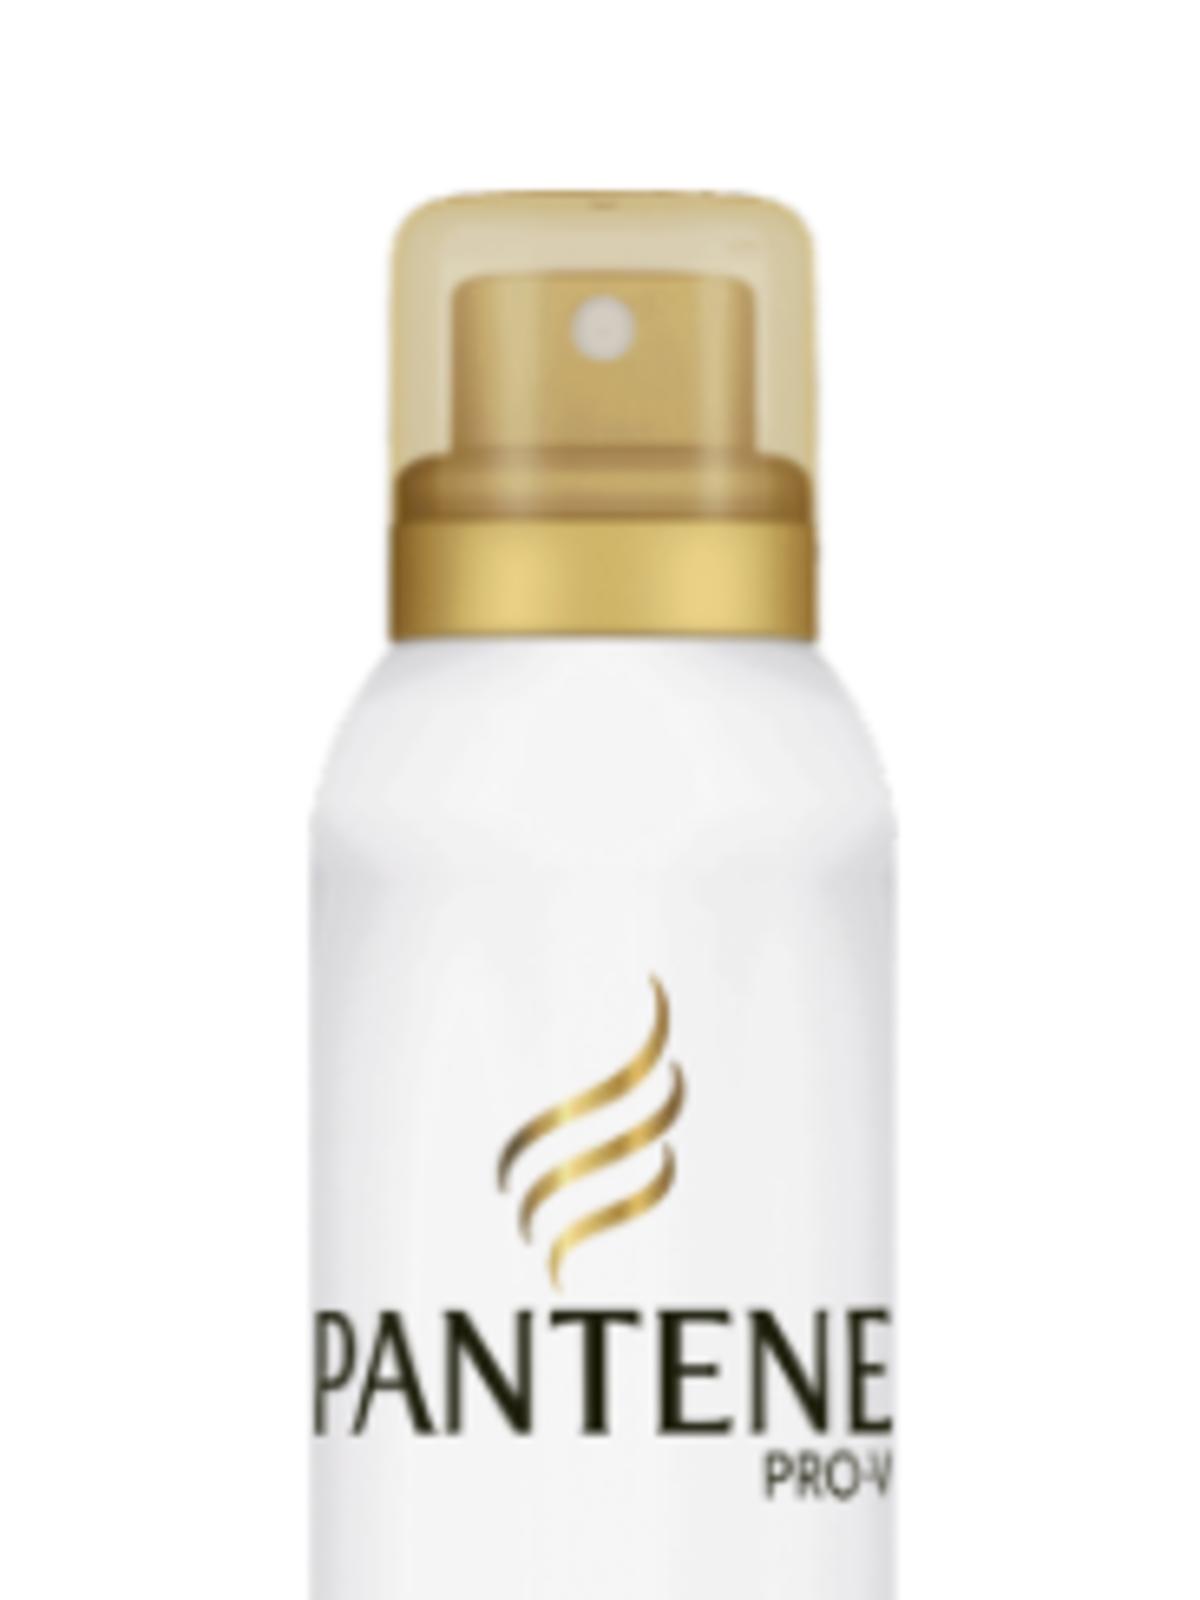 Pantene, Pro-V, Volume Booster, Dry Shampoo